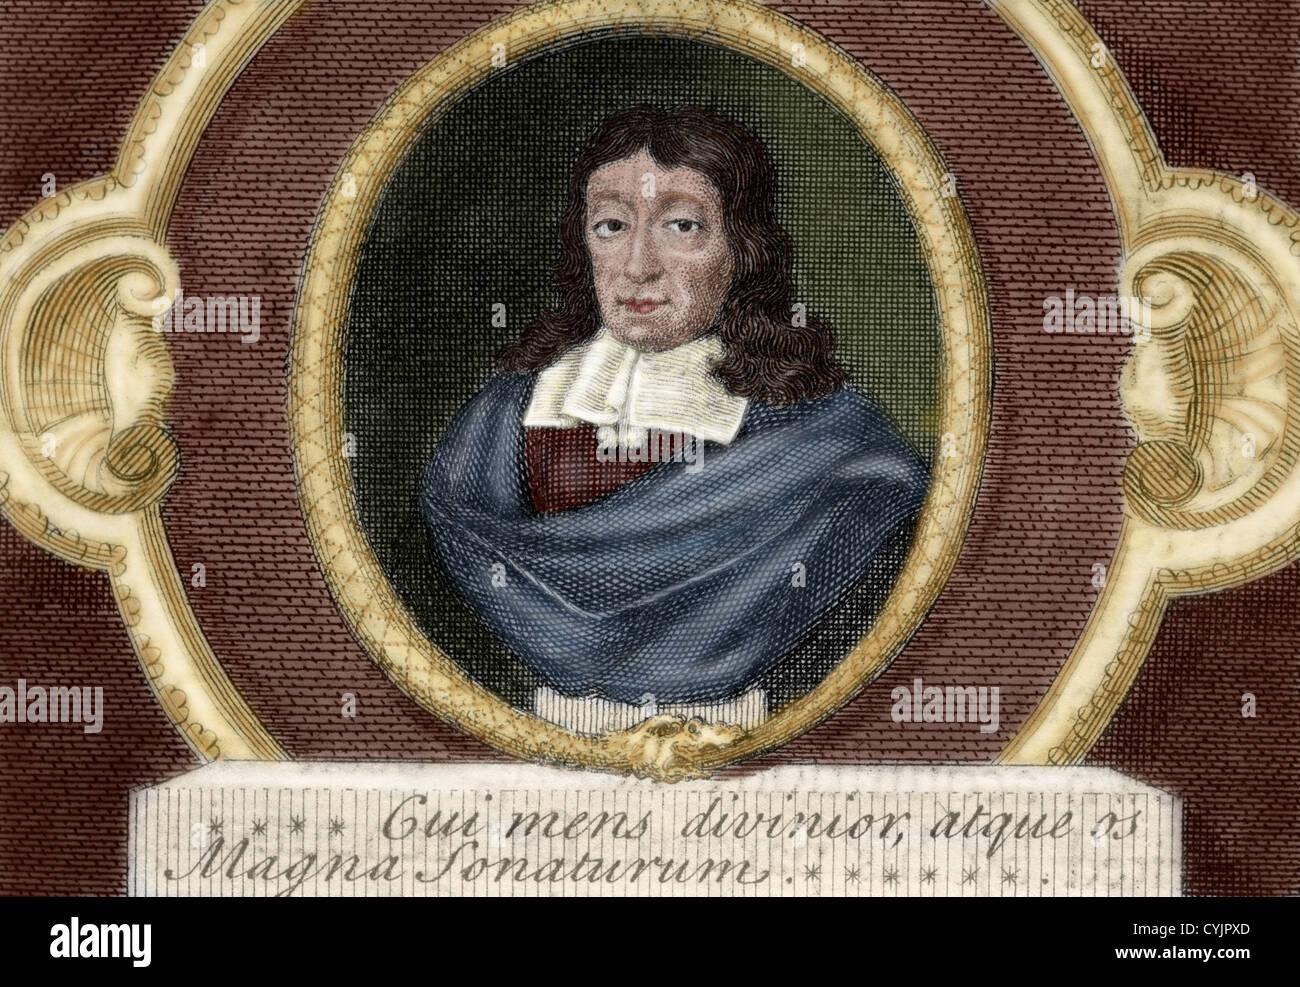 John Milton (1608-1674). British poet. Colored engraving. 19th century. - Stock Image